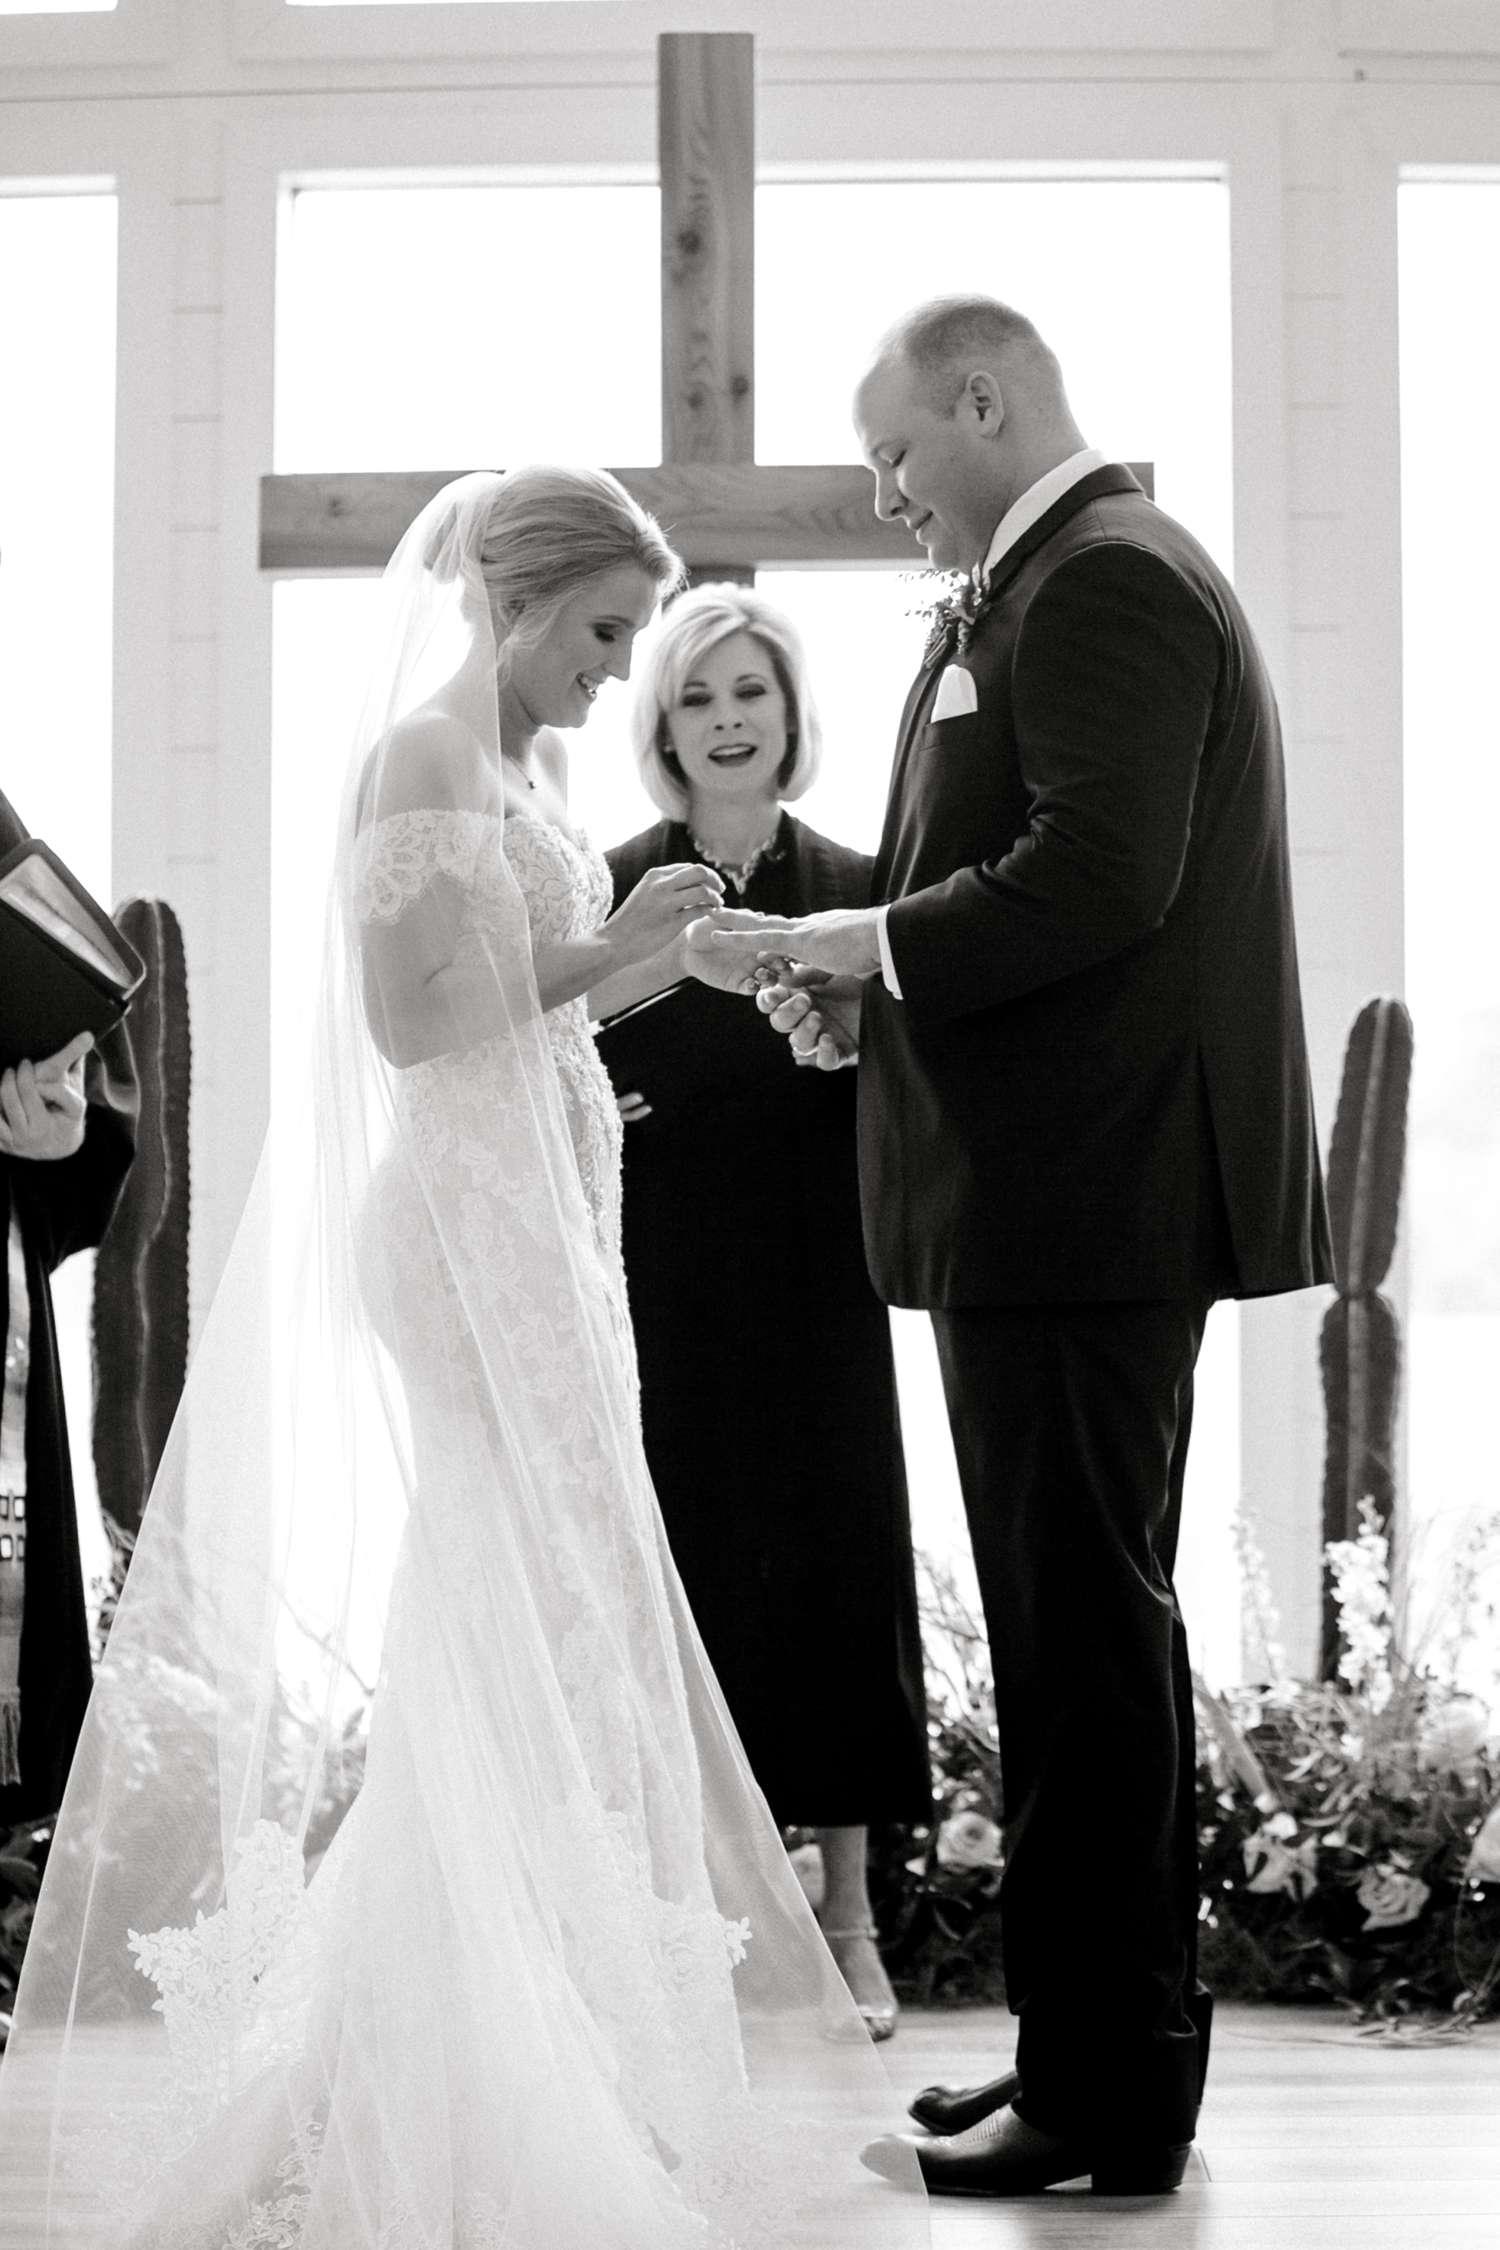 HEBERT_MORGAN_AND_CLAY_ALLEEJ_THE_FARMHOUSE_MONTGOMERY_TEXAS_WEDDING_0110.jpg